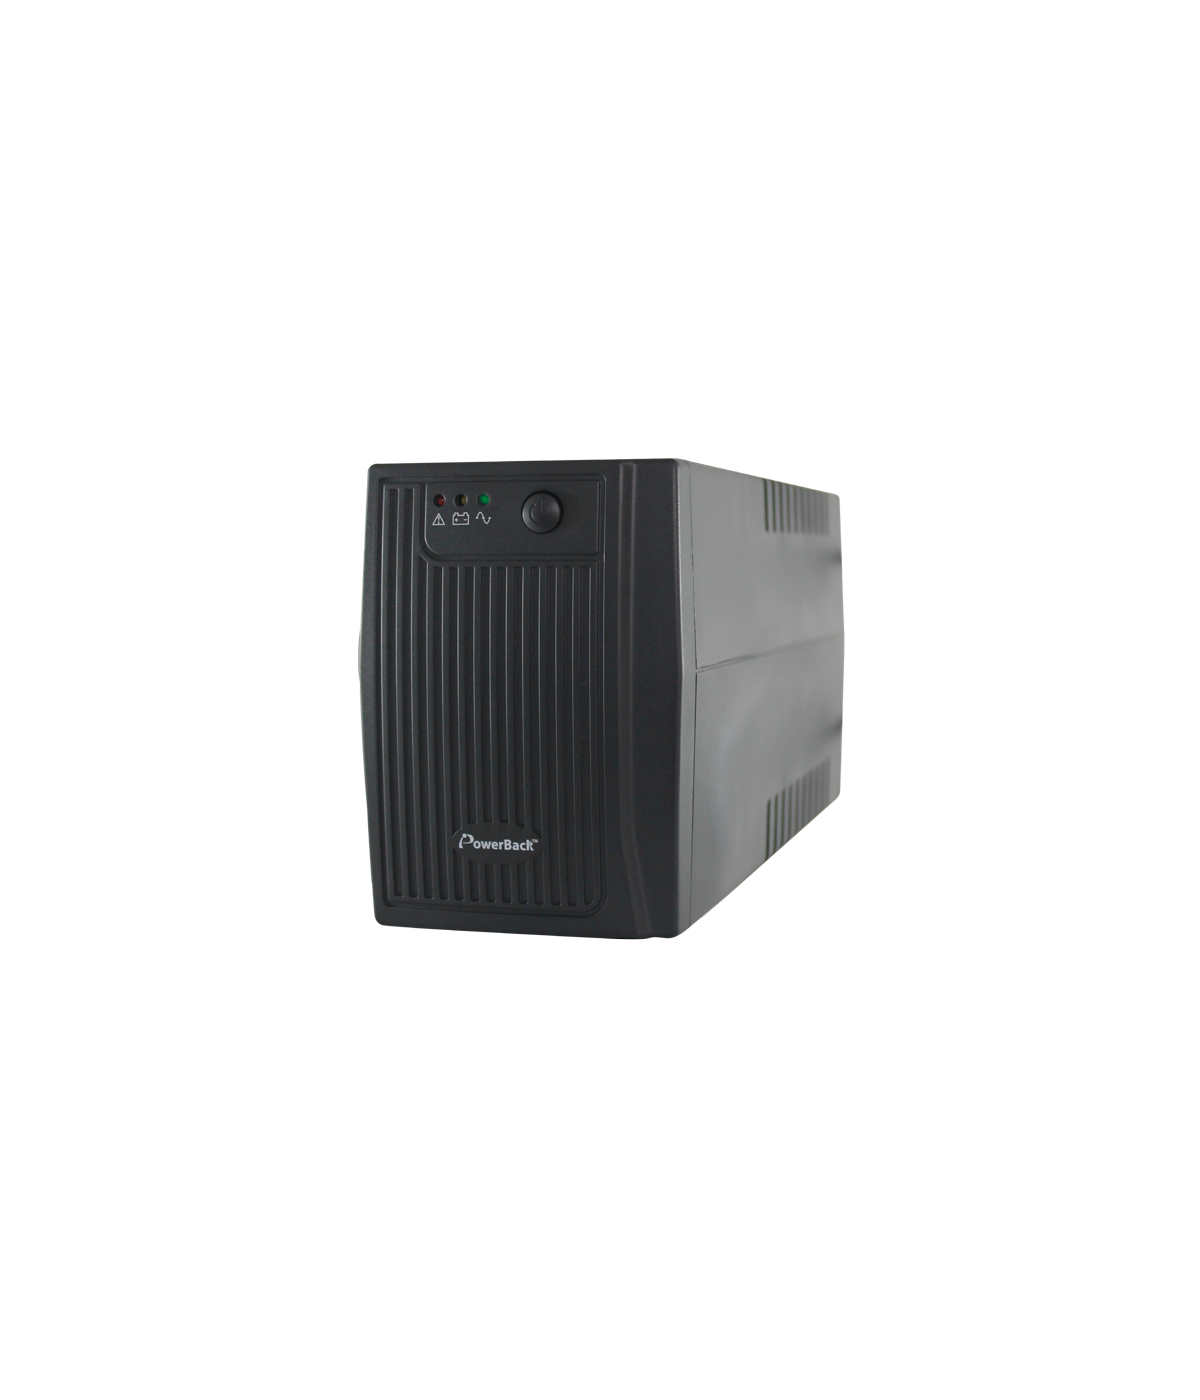 UPS POWERBACK 750VA NEWLINE INTERACTIVA